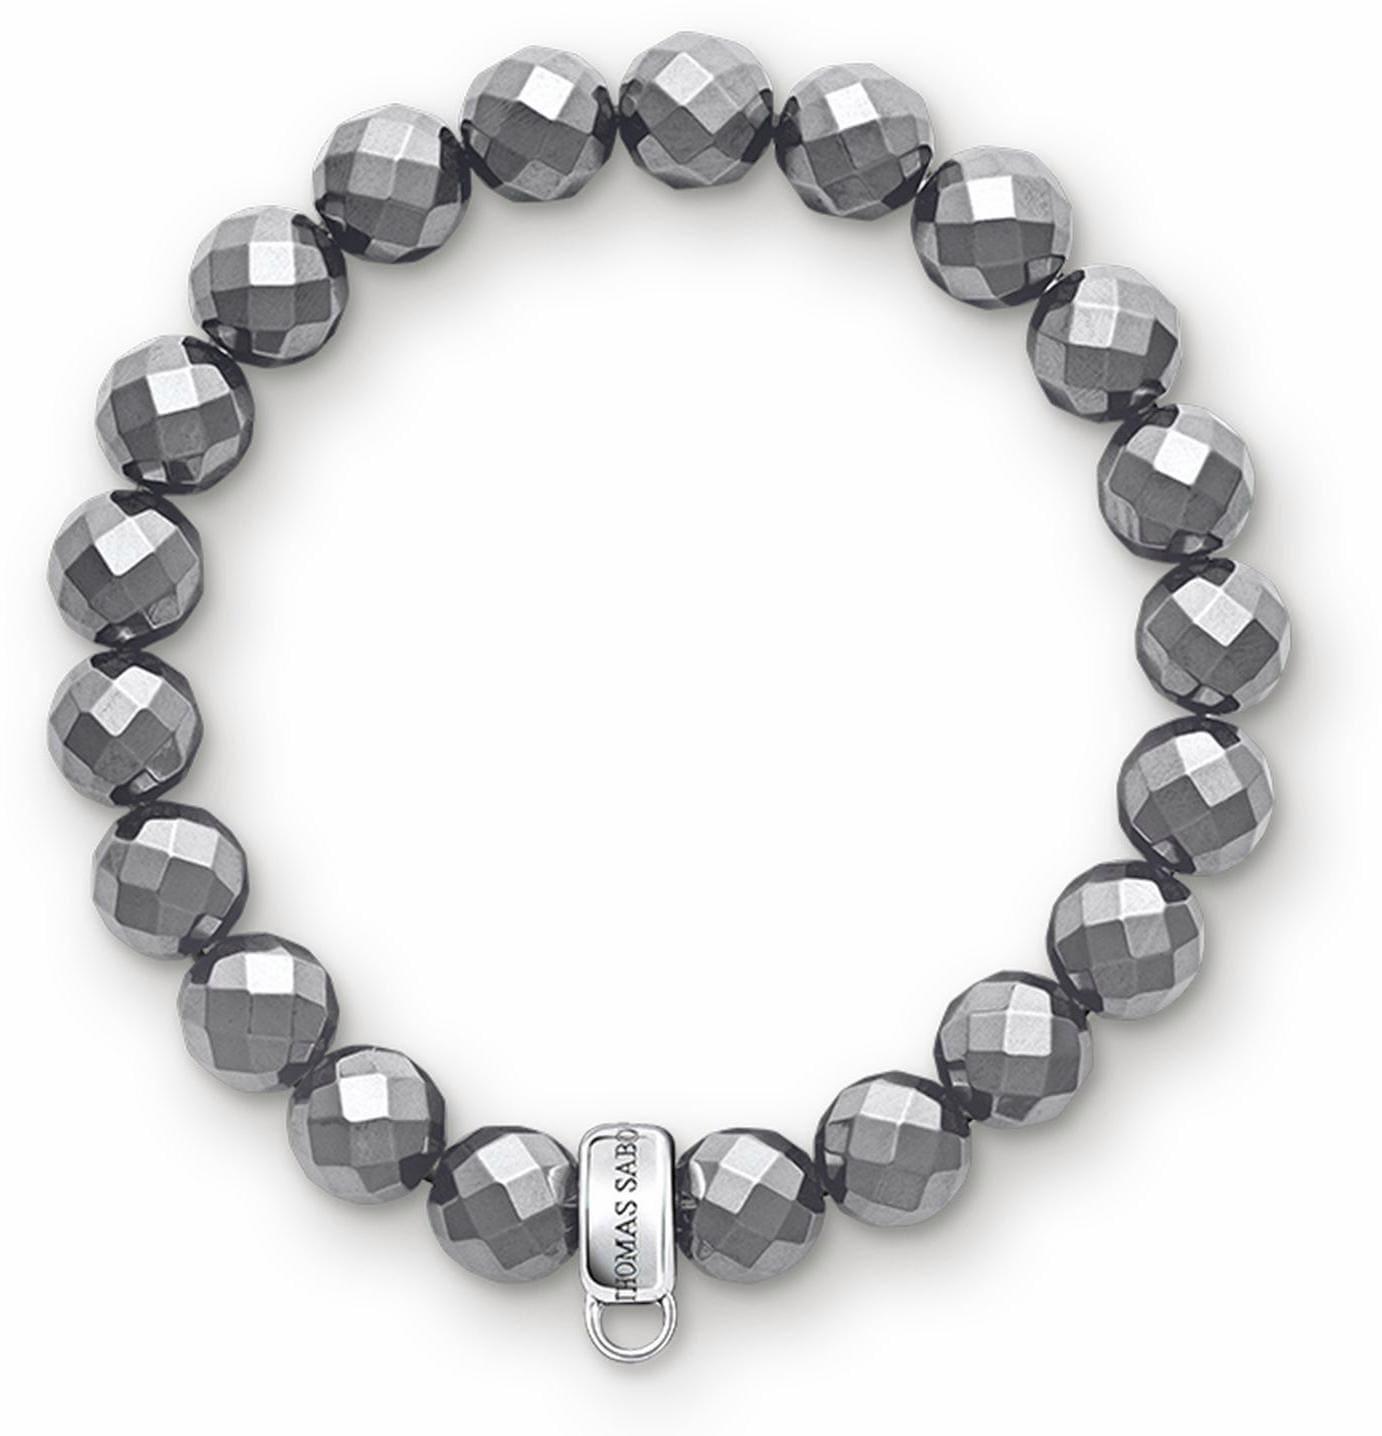 THOMAS SABO Charm-Armband X0187-064-11-M 11-S | Schmuck > Armbänder > Charm-Armbänder | Grau | Thomas Sabo